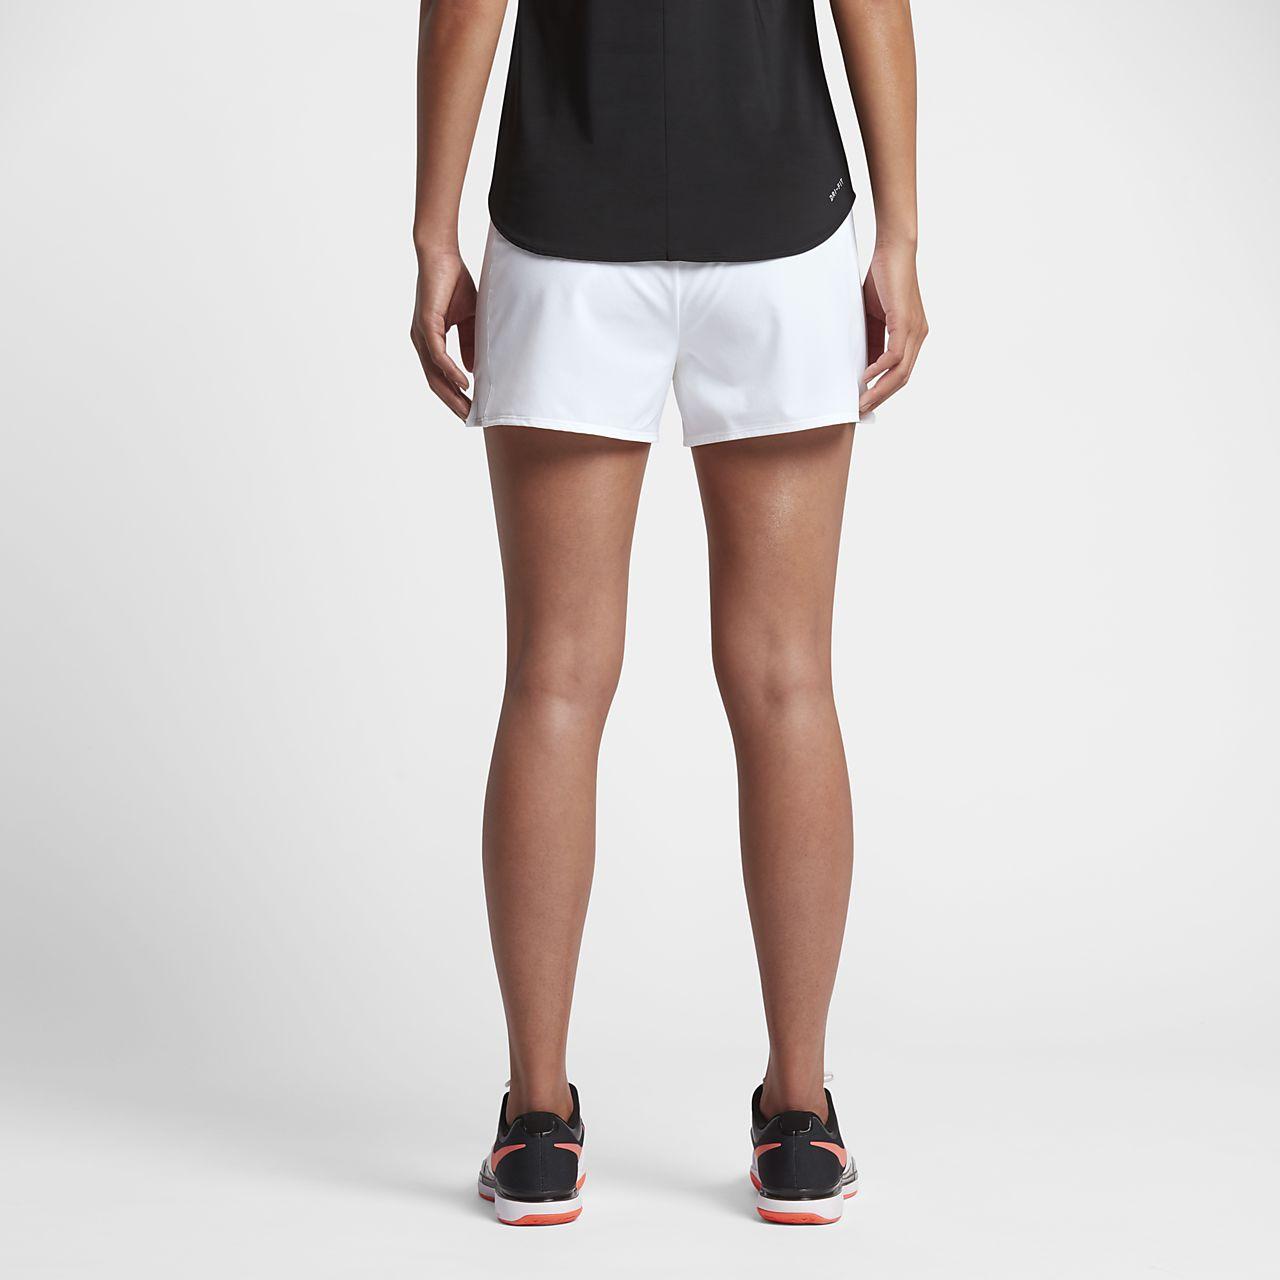 nikecourt flex pure women 39 s tennis shorts. Black Bedroom Furniture Sets. Home Design Ideas